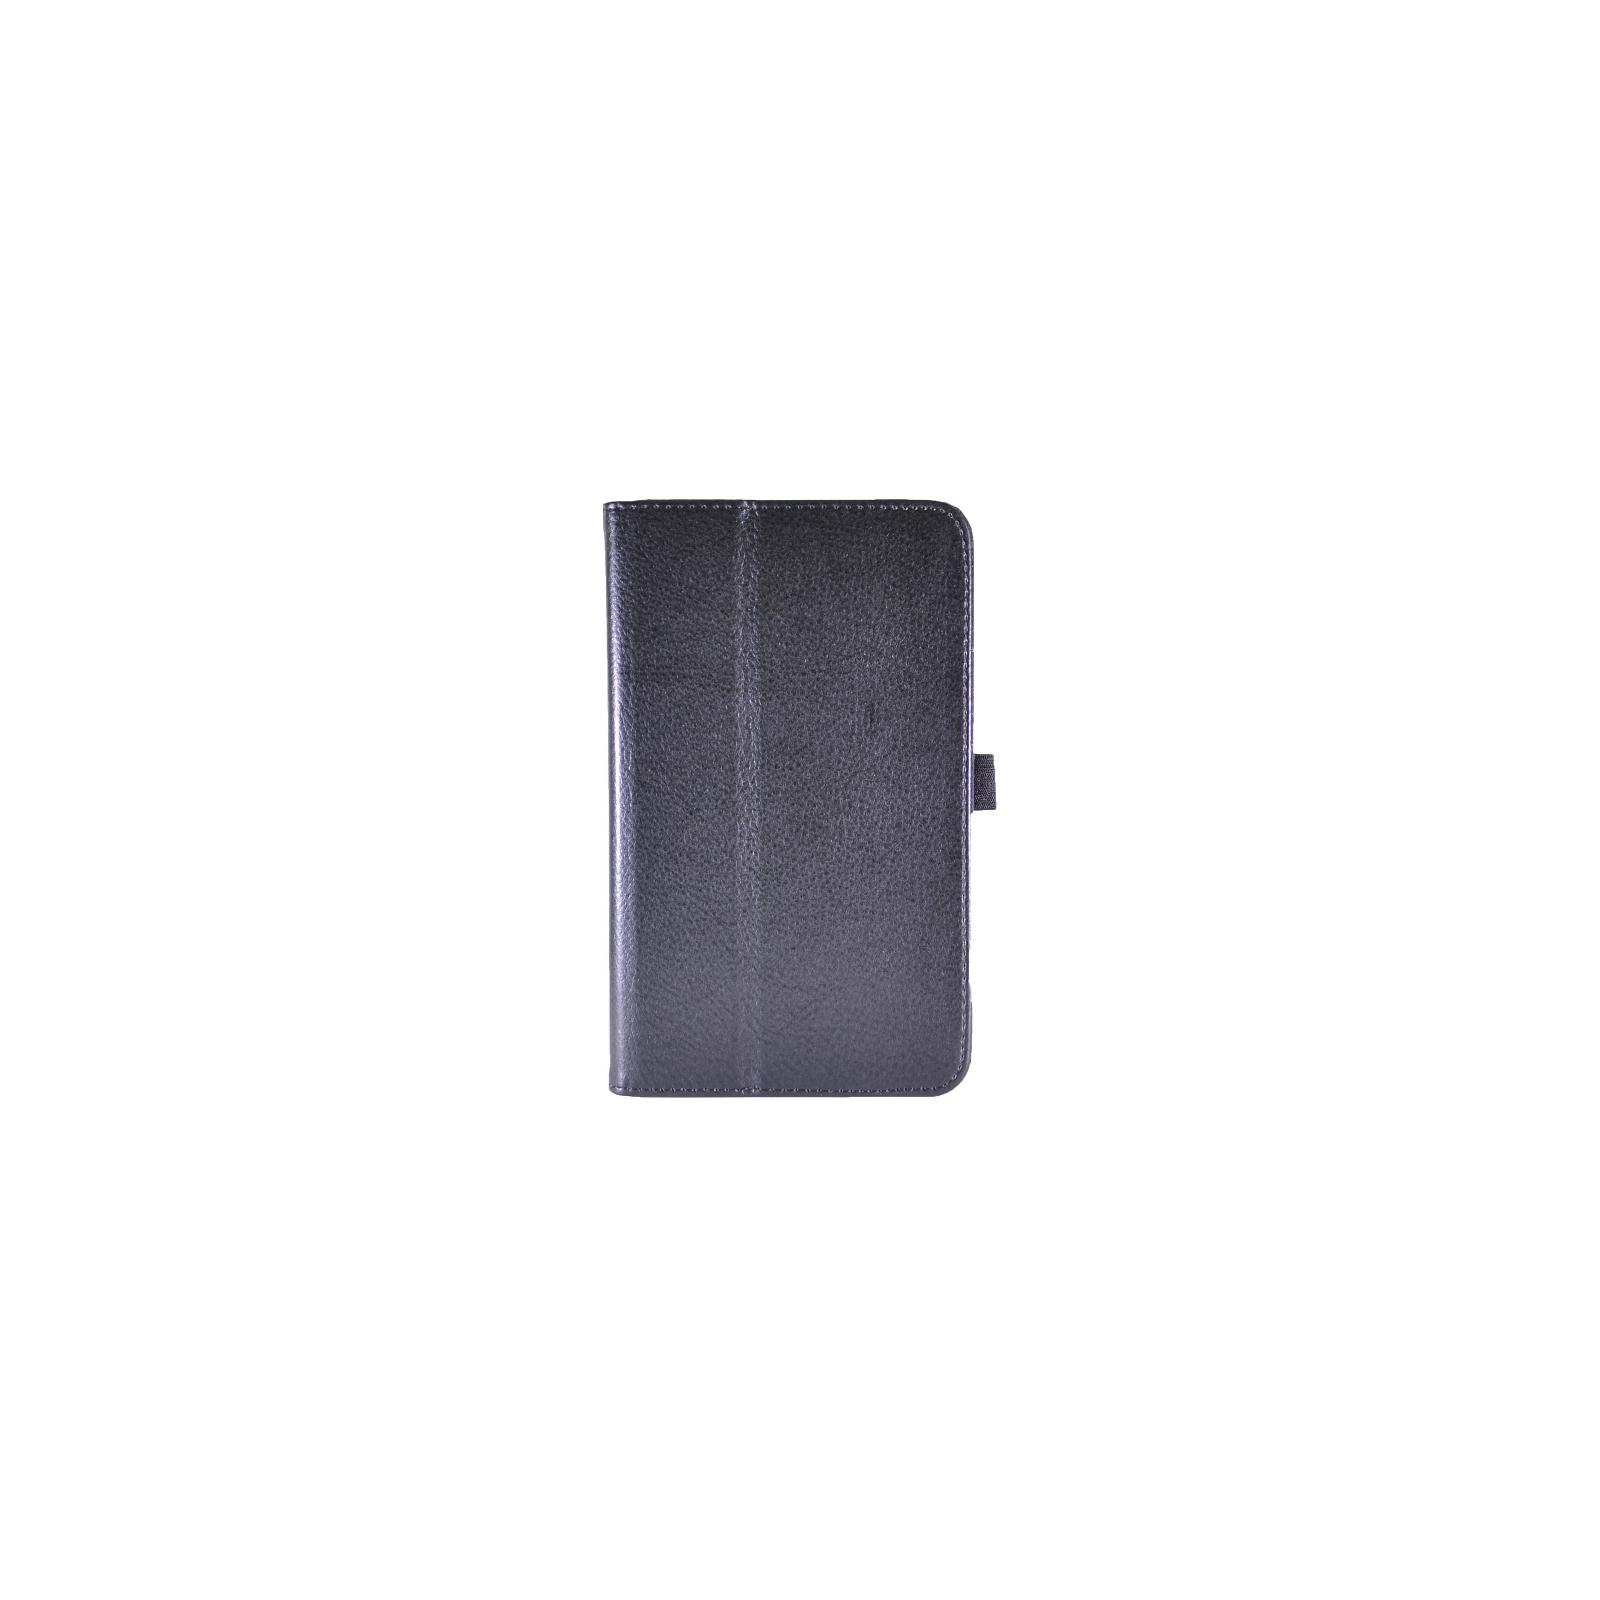 "Чехол для планшета Pro-case 7"" Pro-case Asus 7"" MeMO Pad ME170 black (ME170b)"